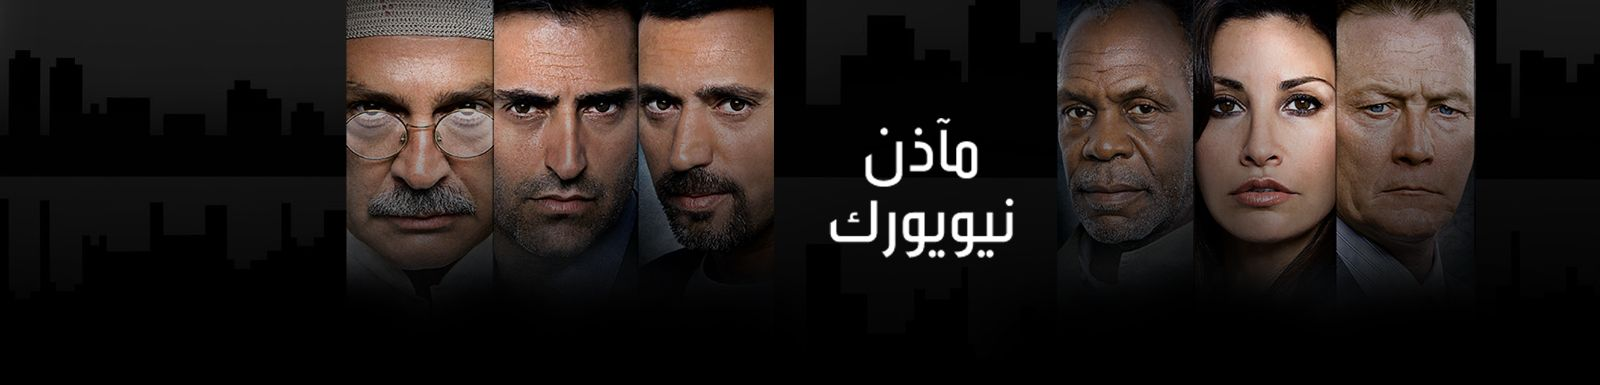 ����� ����� ���� ������� ������ 2 MBC shahid ���� ��